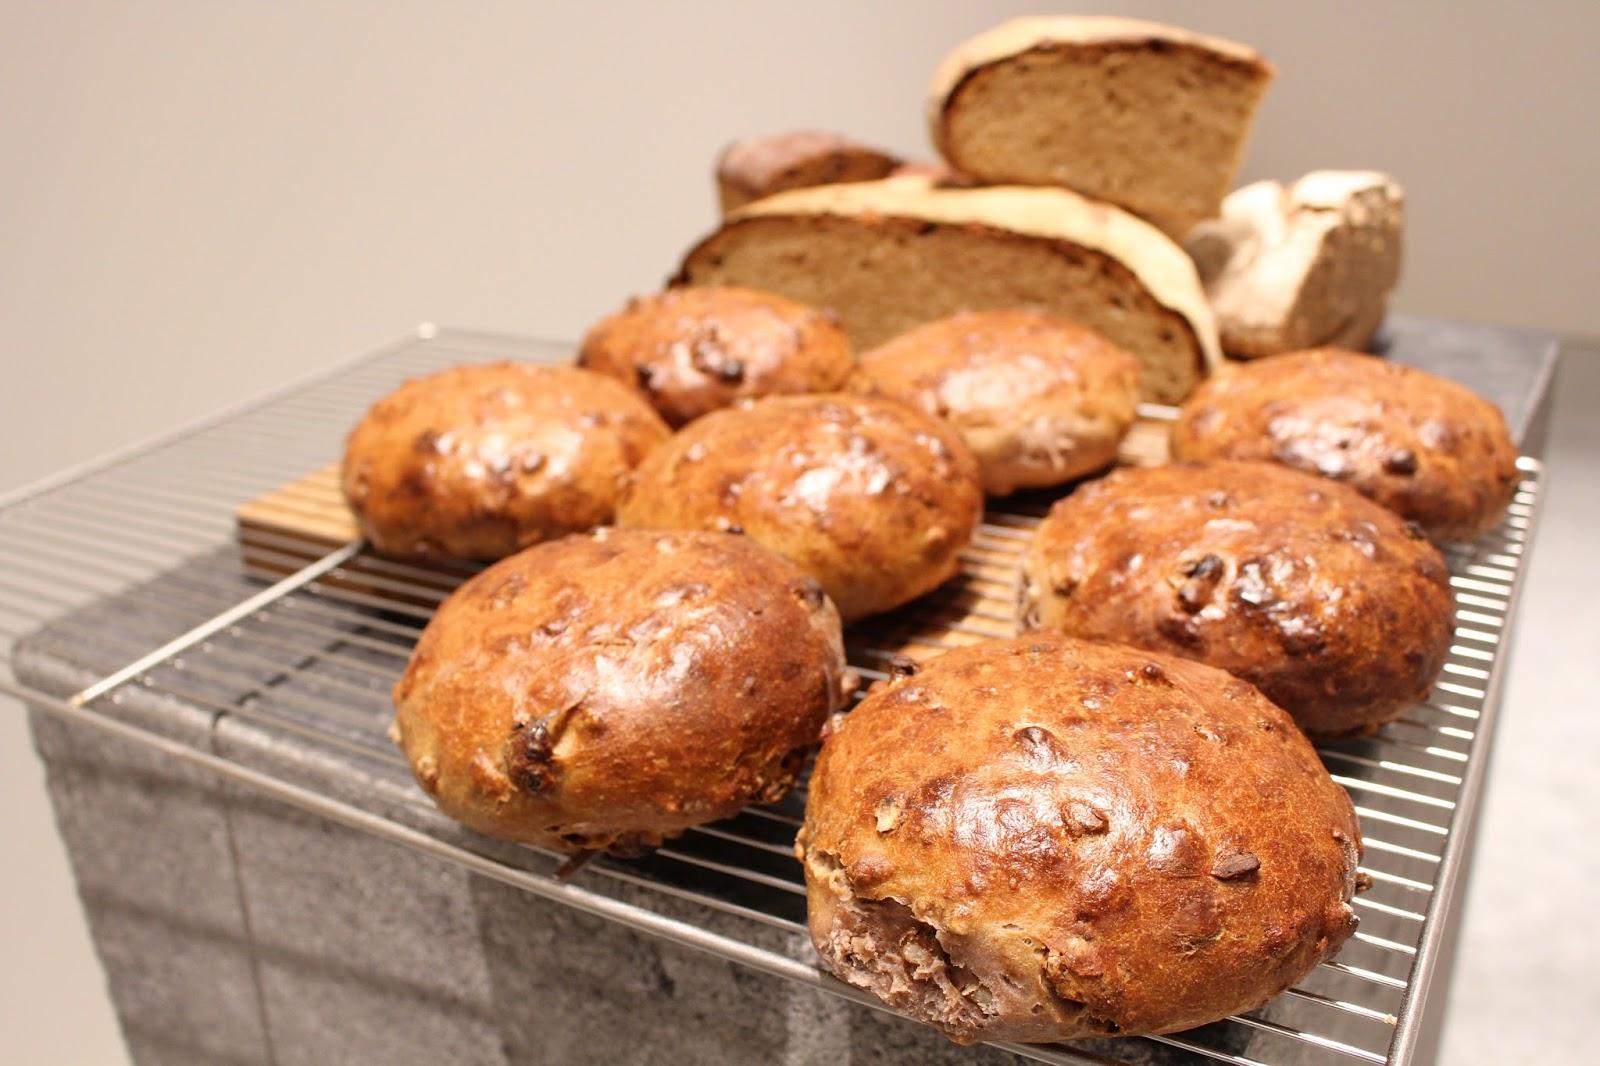 Poilâne Kanaal walnoot zuurdesem brood